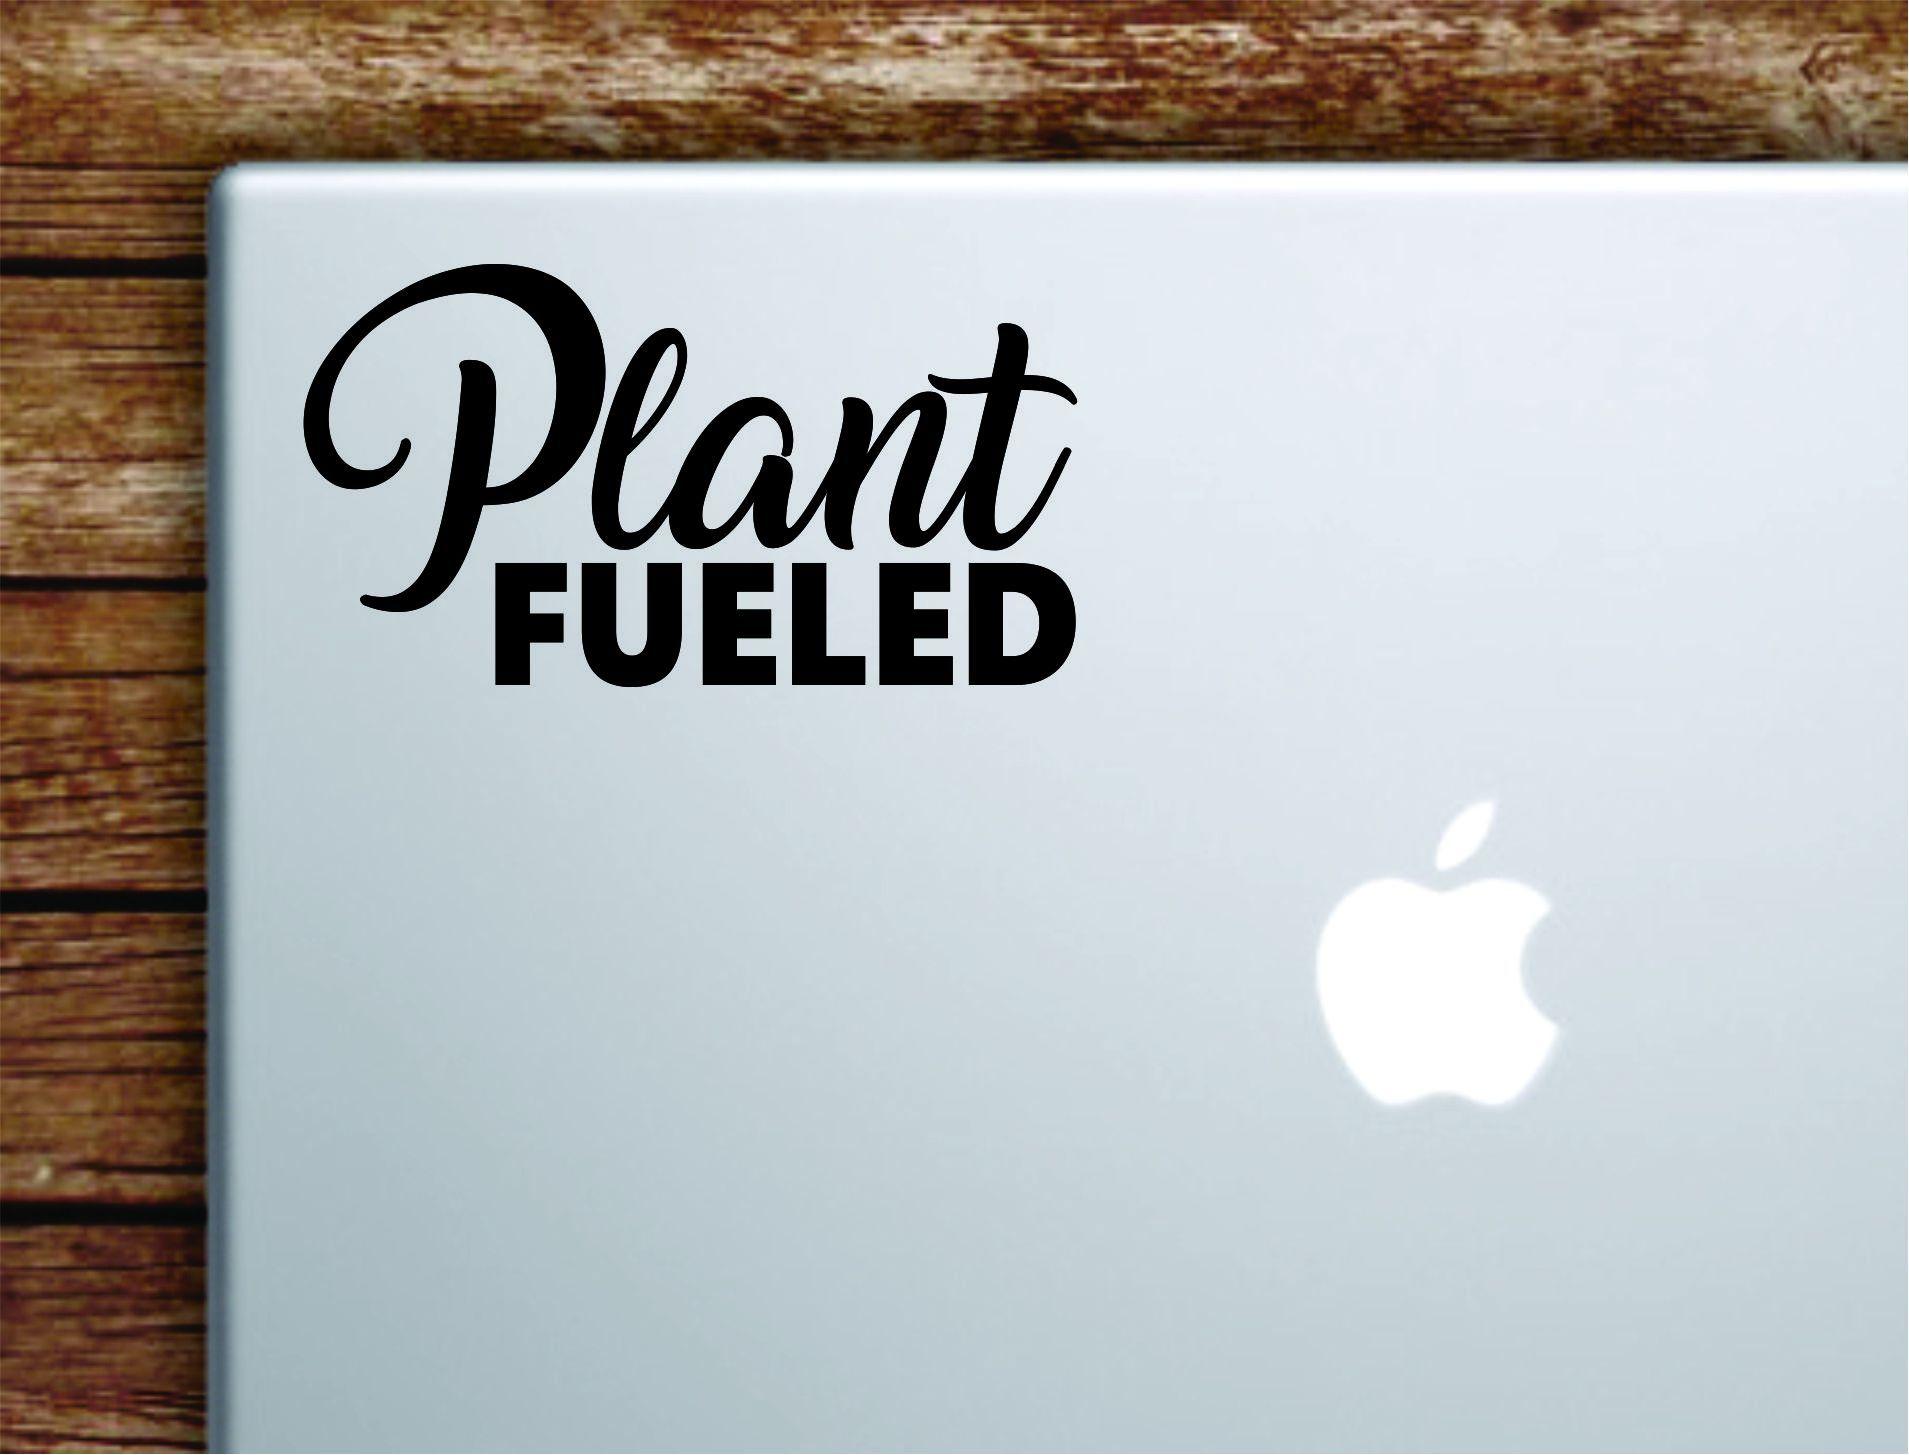 Plant Fueled Laptop Wall Decal Sticker Vinyl Art Quote Macbook Apple Decor Car Window Truck Teen Inspirational Girls Vegan - vivid blue